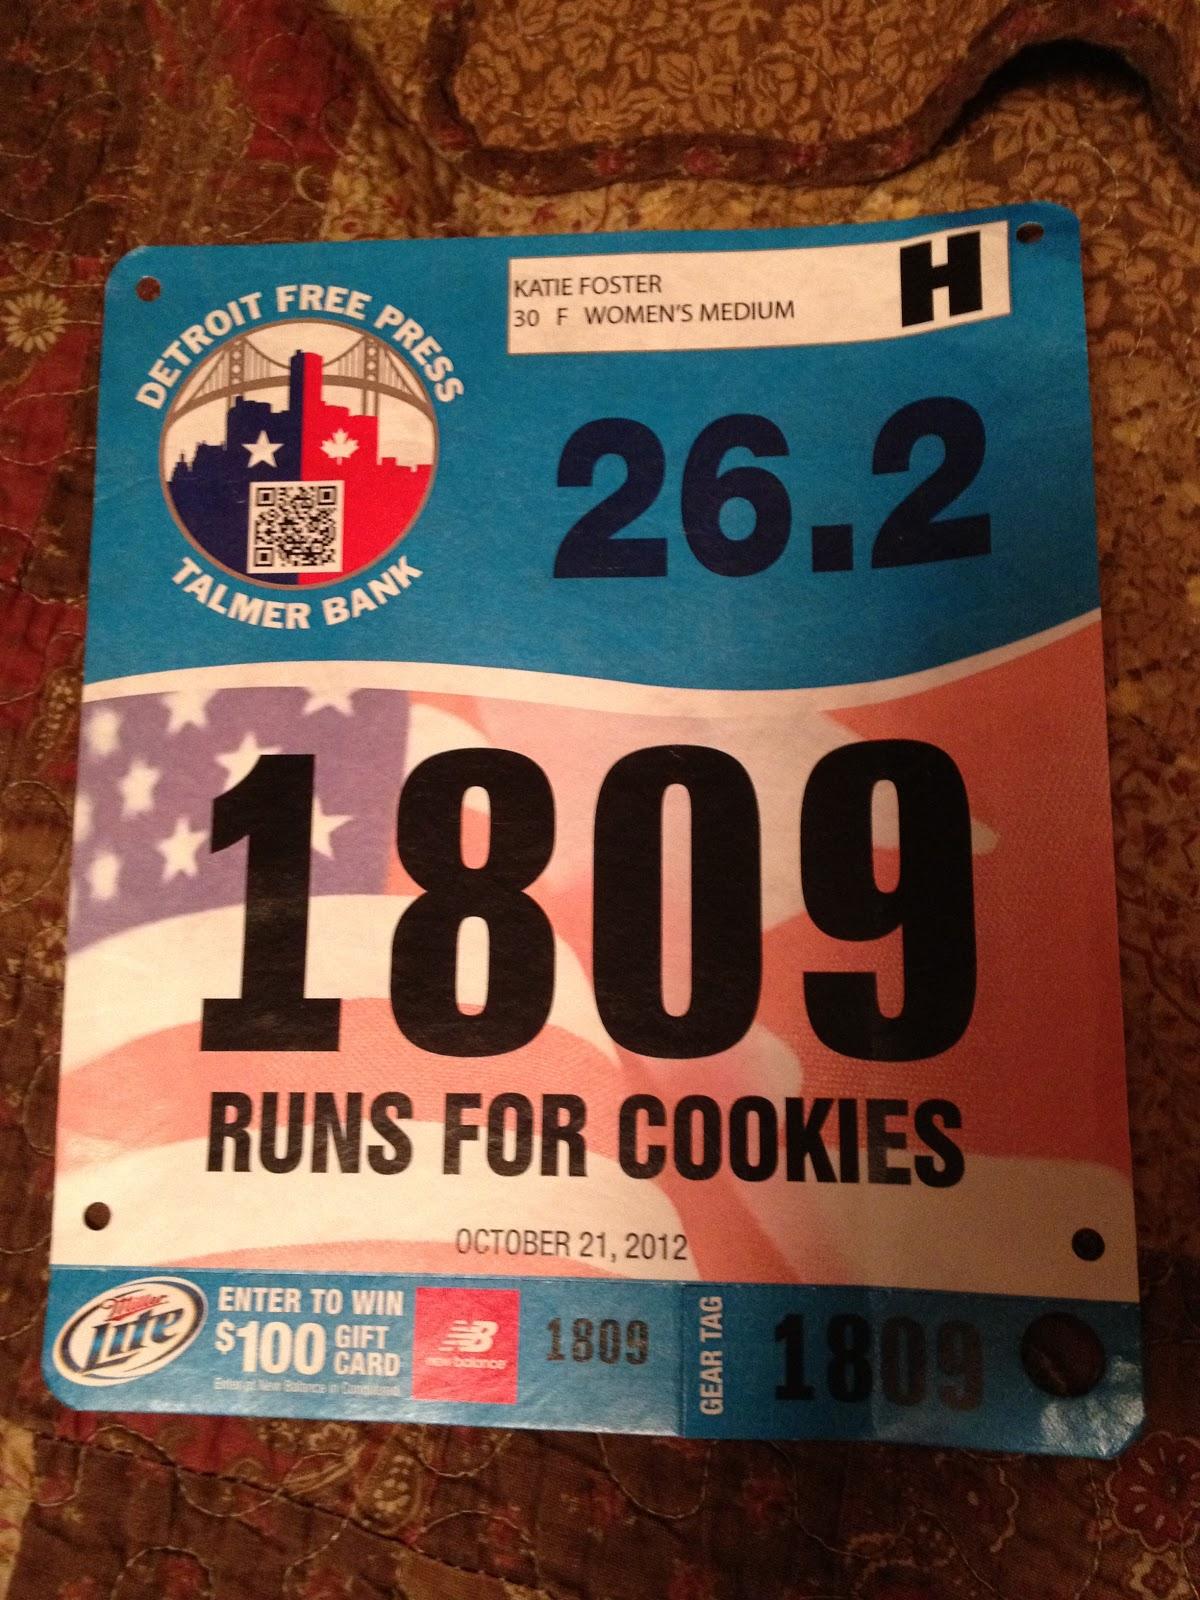 Runs for Cookies: Marathon eve